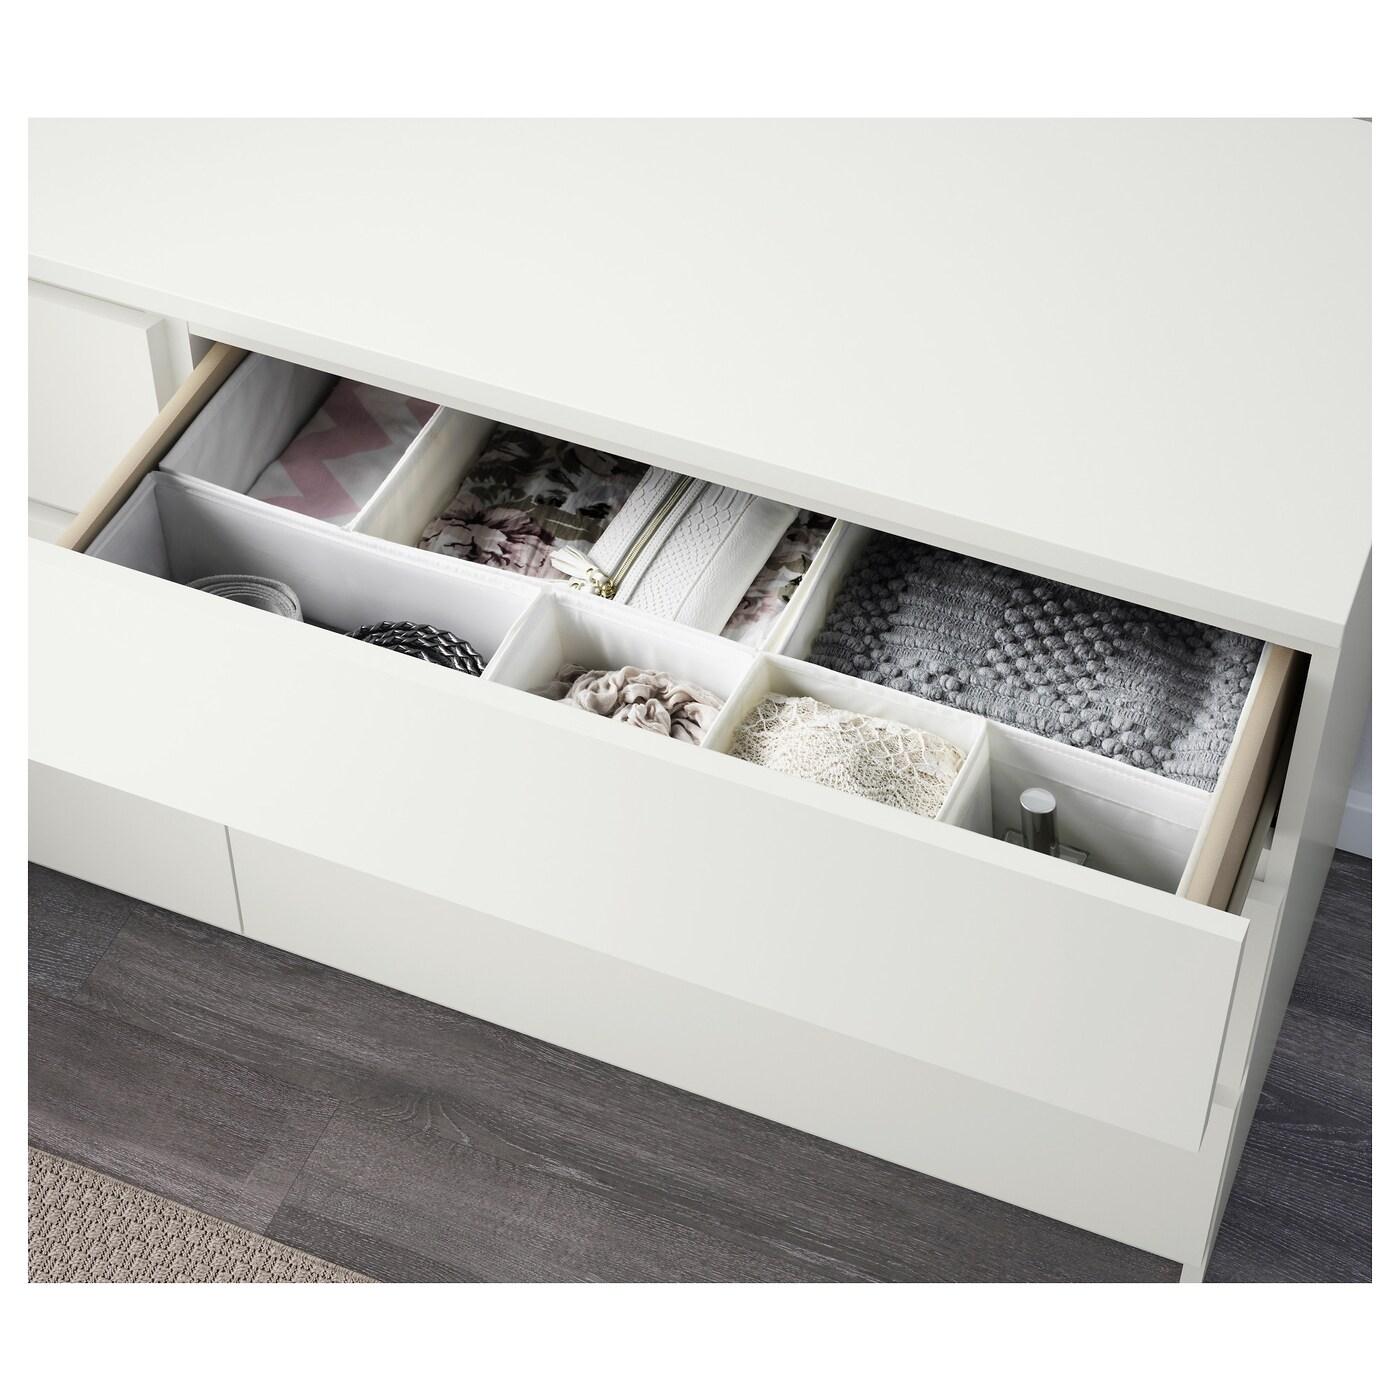 Malm commode 6 tiroirs blanc 160x78 cm ikea - Commode ikea malm 6 tiroirs occasion ...